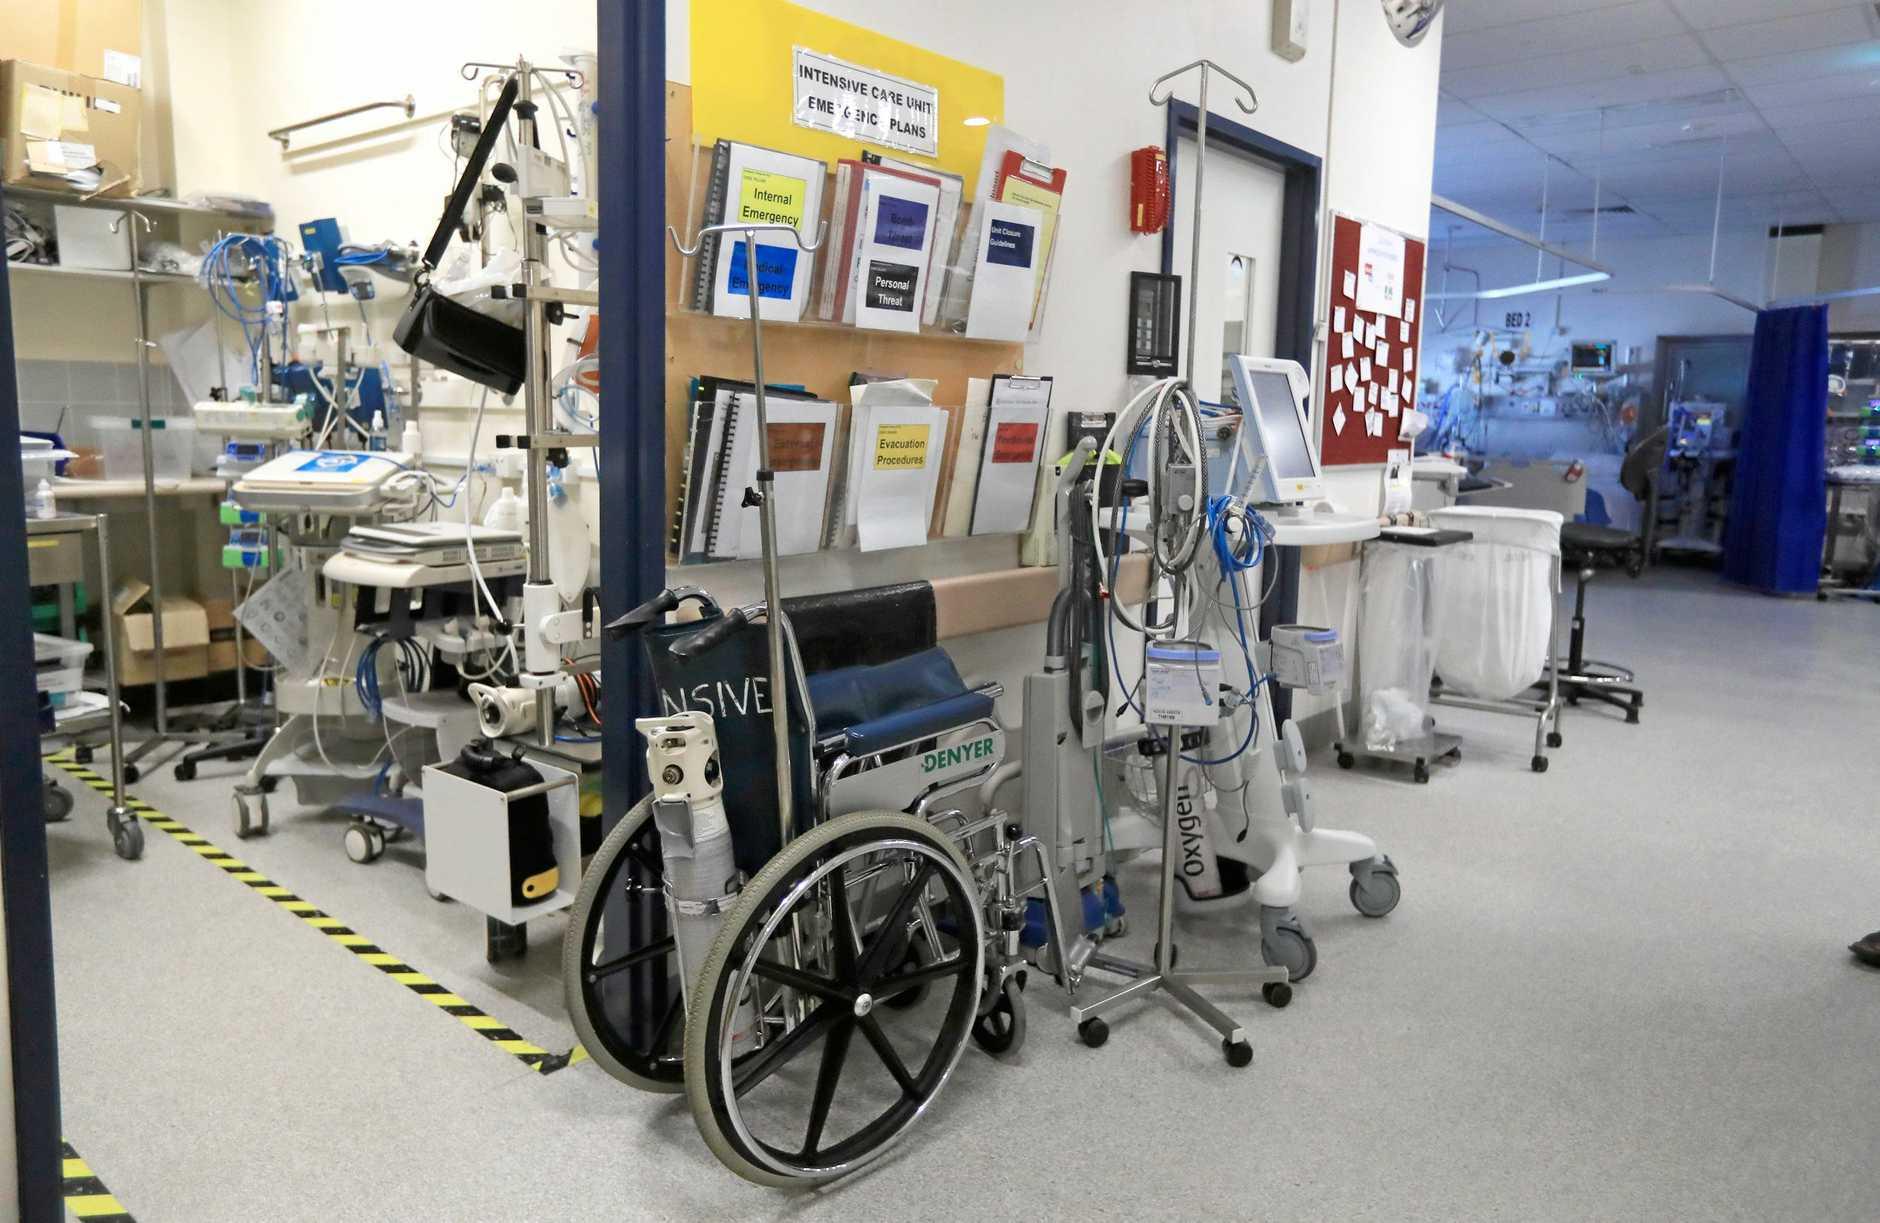 Tweed Heads Hospital